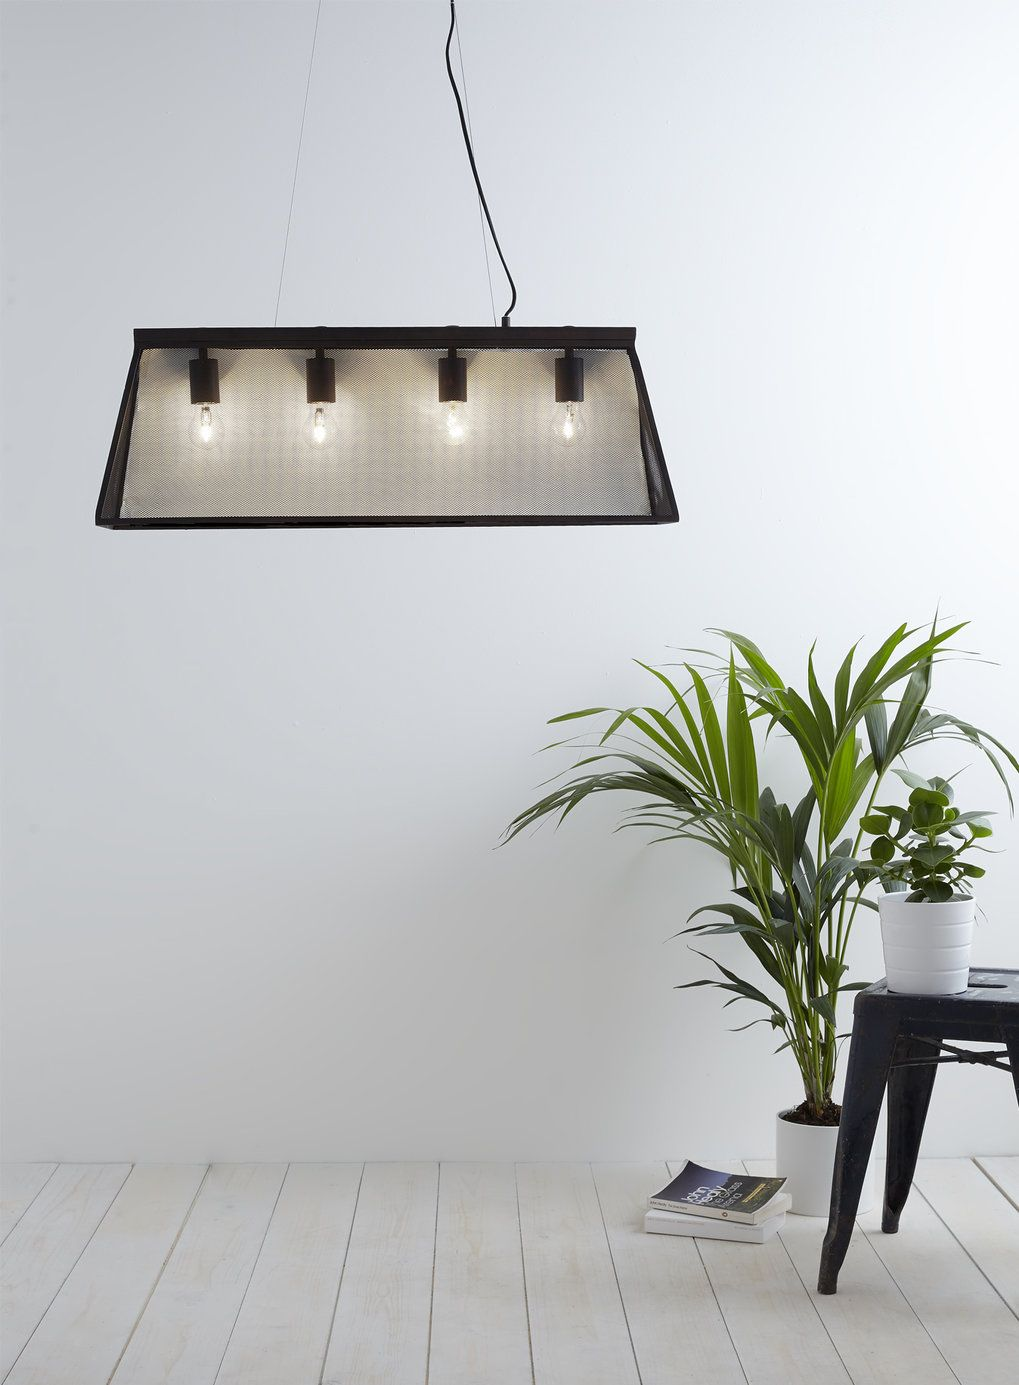 Jaxon 4 Light Pendant   Future home   Pinterest   Bhs, Ceiling ...